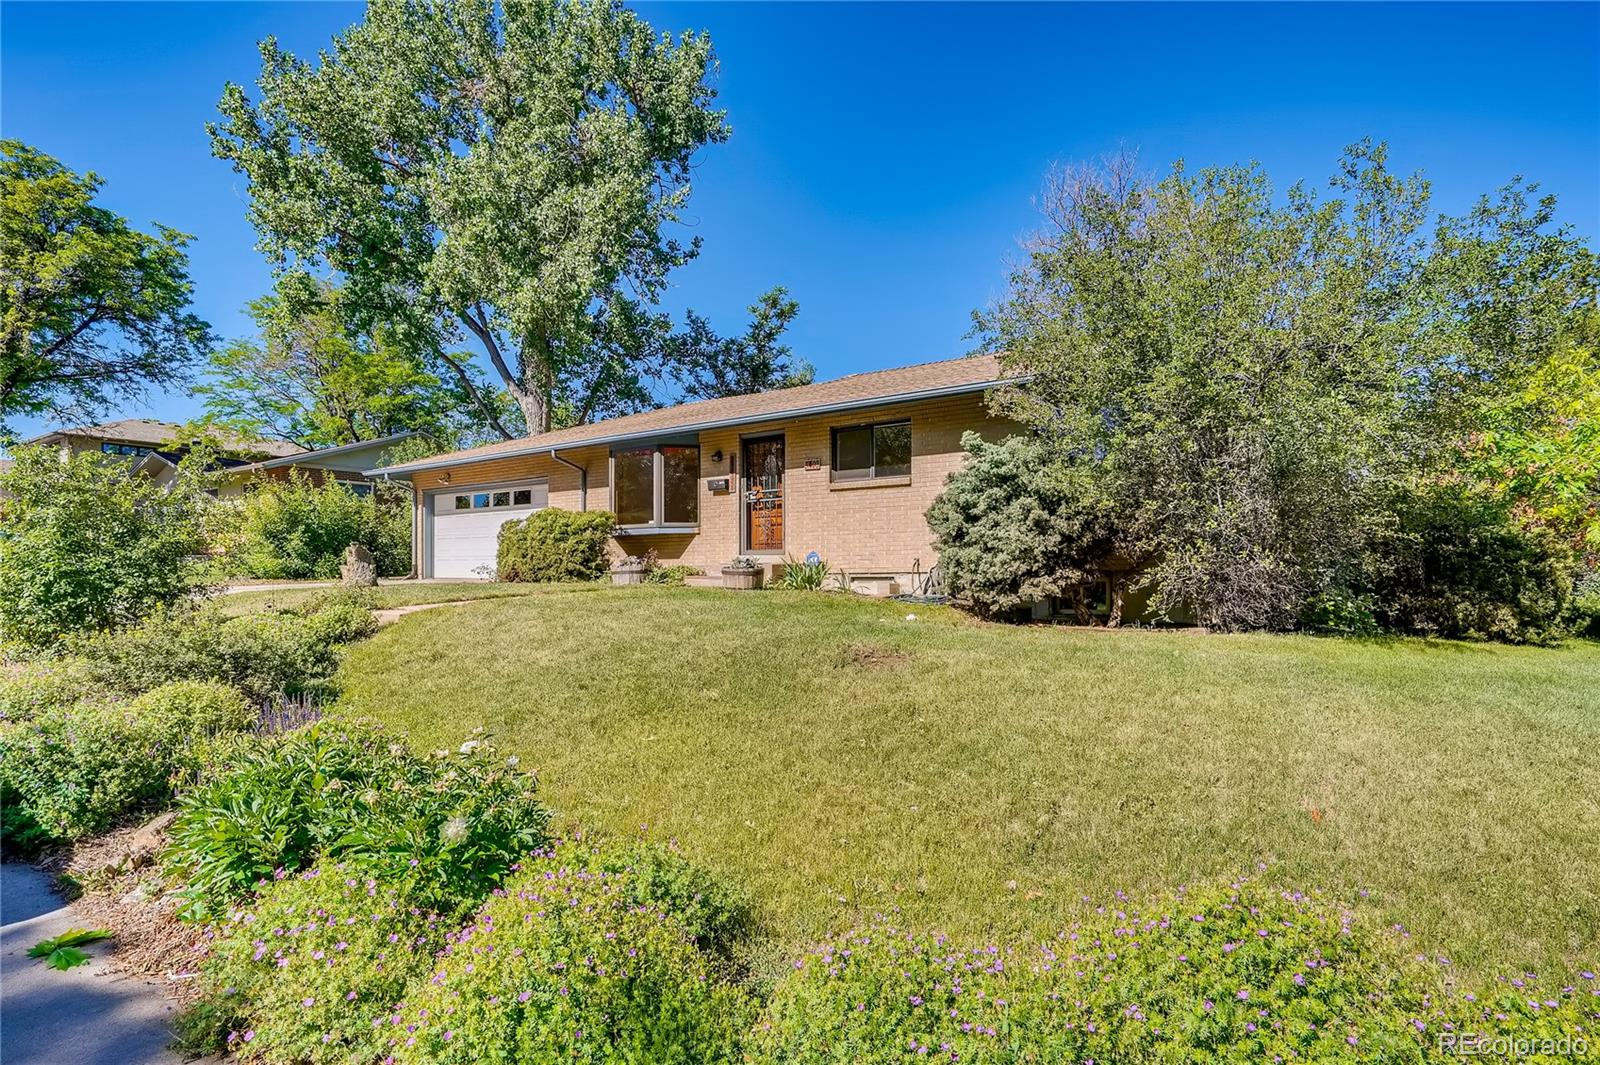 3403 S Ivanhoe Way Property Photo - Denver, CO real estate listing